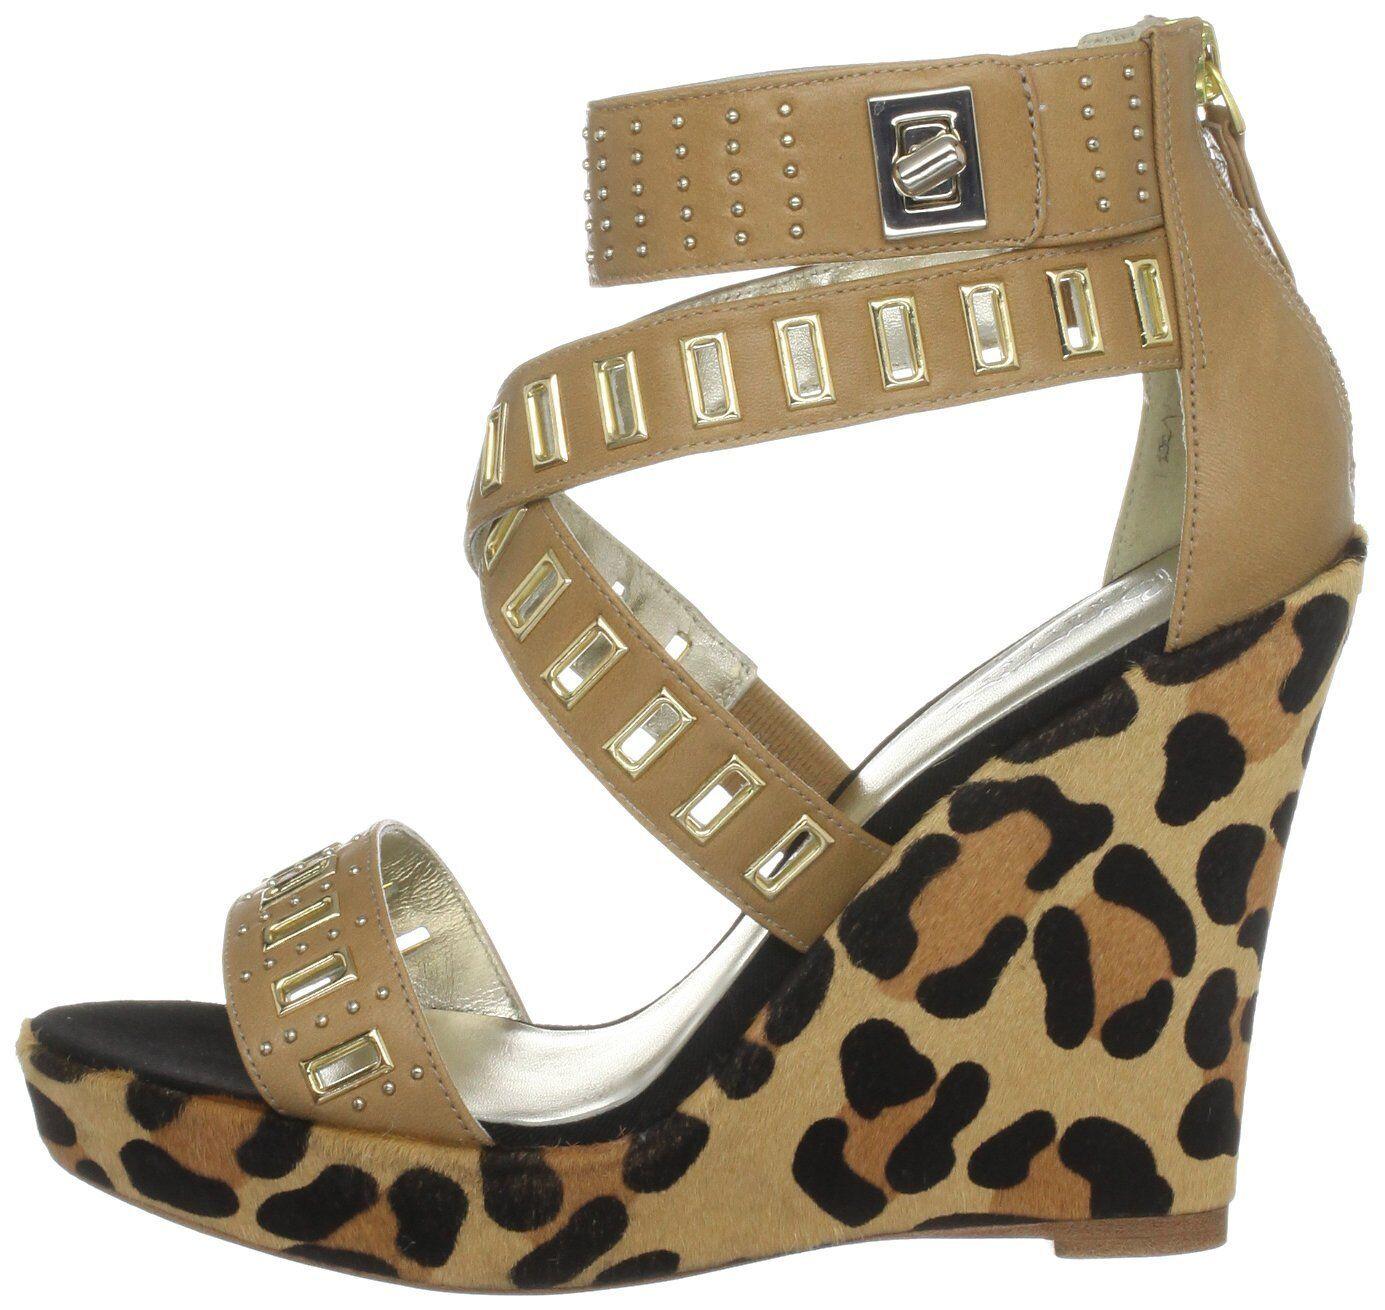 Millones de EUR Talle 5   6.5 Bourne Bourne Bourne Nadine Leopardo Pony Piel Skin Cuña Zapatos Sandalias  conveniente